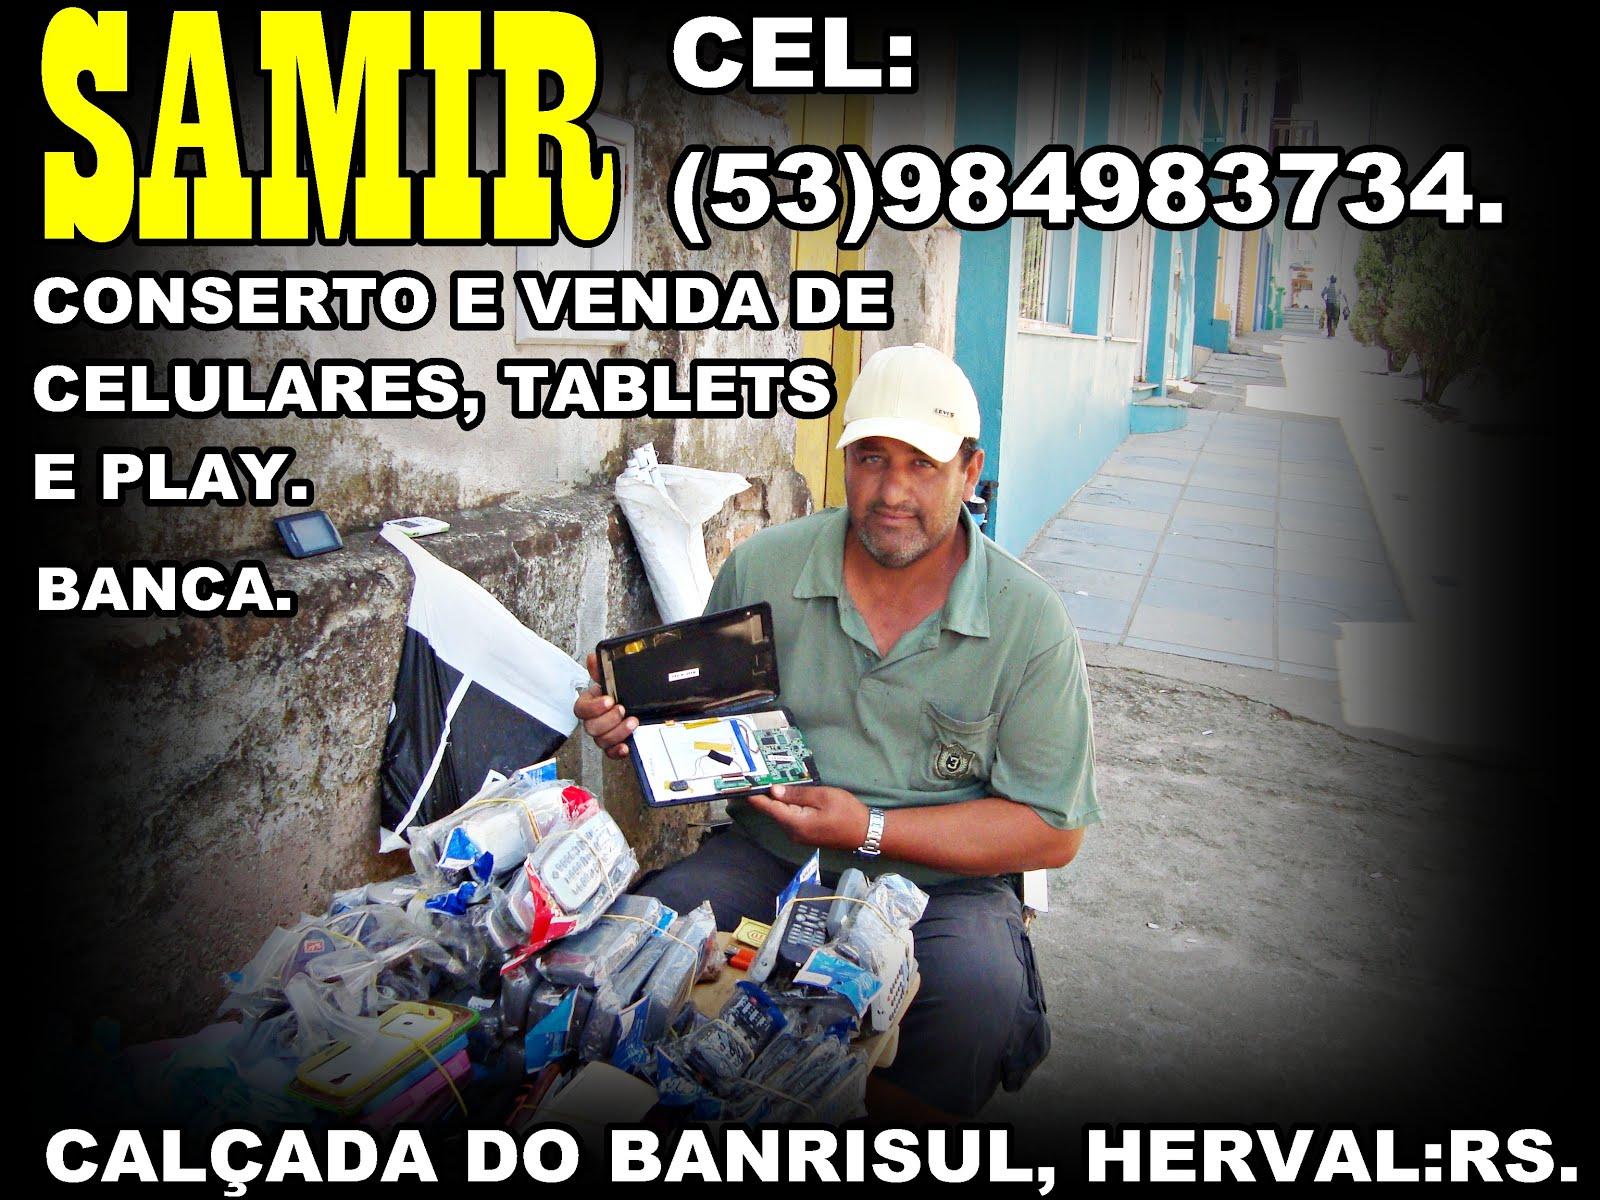 BANCA DO SAMIR.